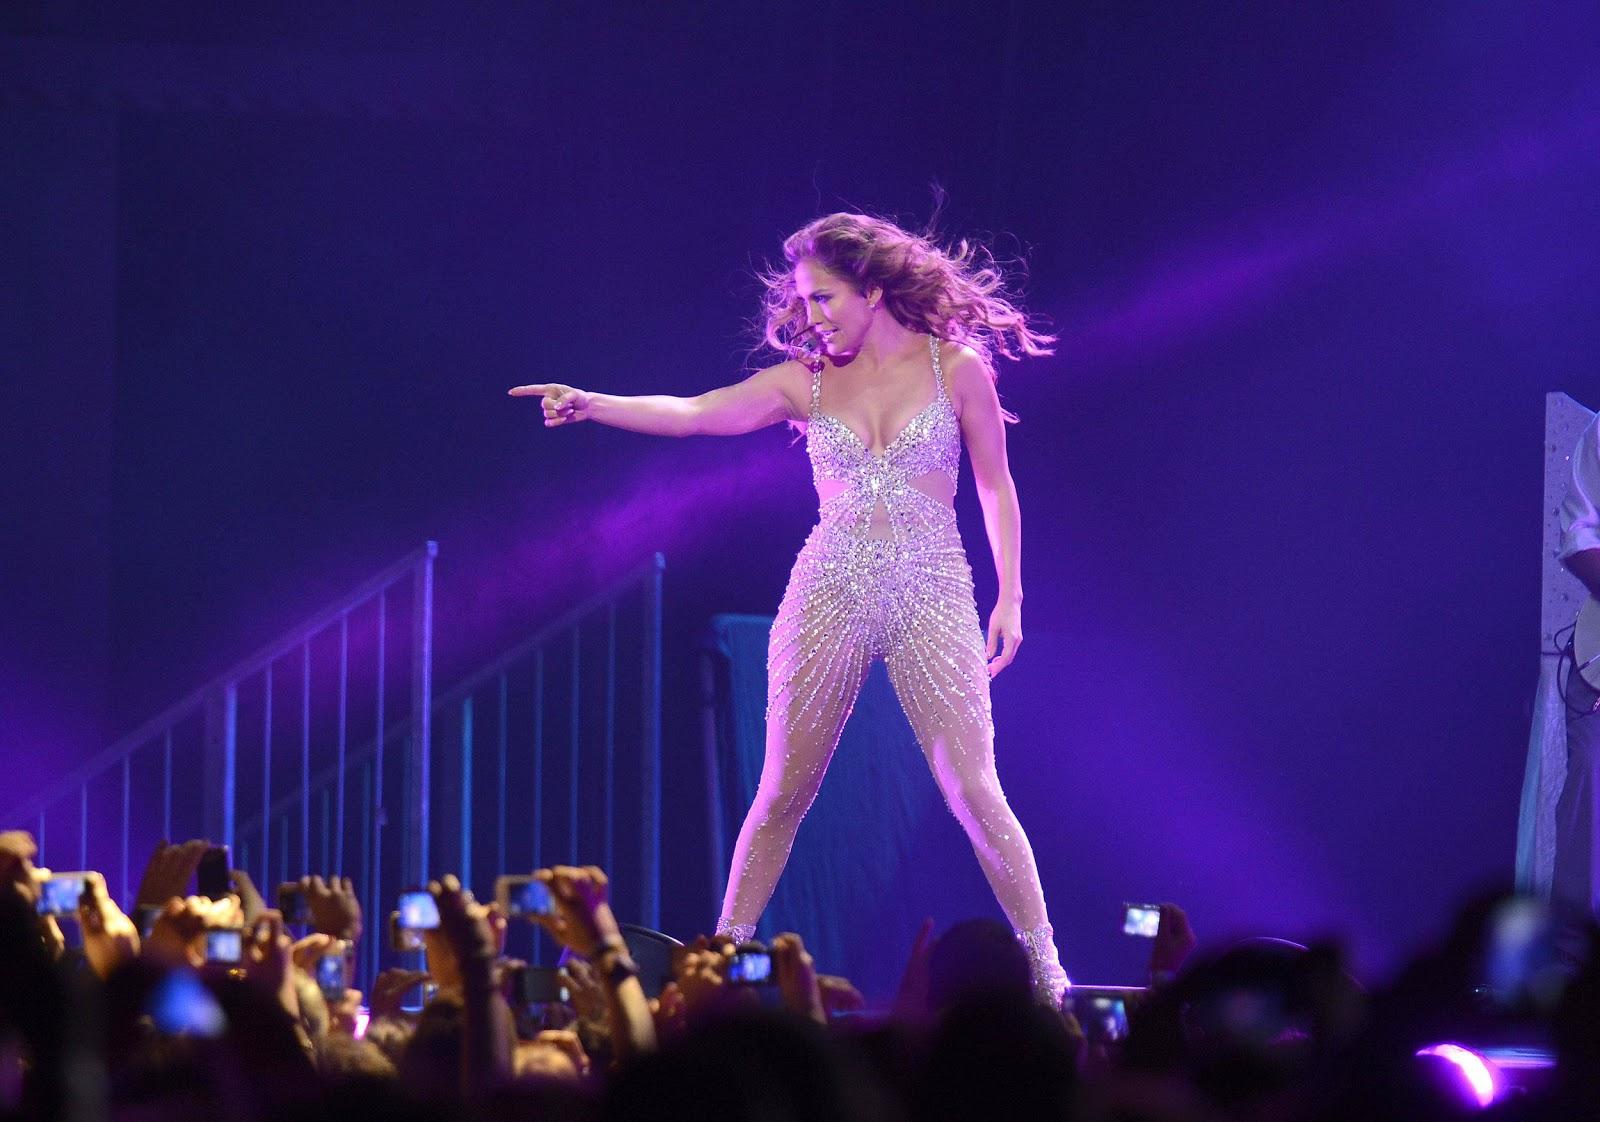 http://4.bp.blogspot.com/-CblU5A02BXA/UHa5wNTYREI/AAAAAAAAino/Gw8tYYYa_kU/s1600/Jennifer+Lopez+-+Concert+in+Madrid+-+October+7%252C+2012+20.jpg